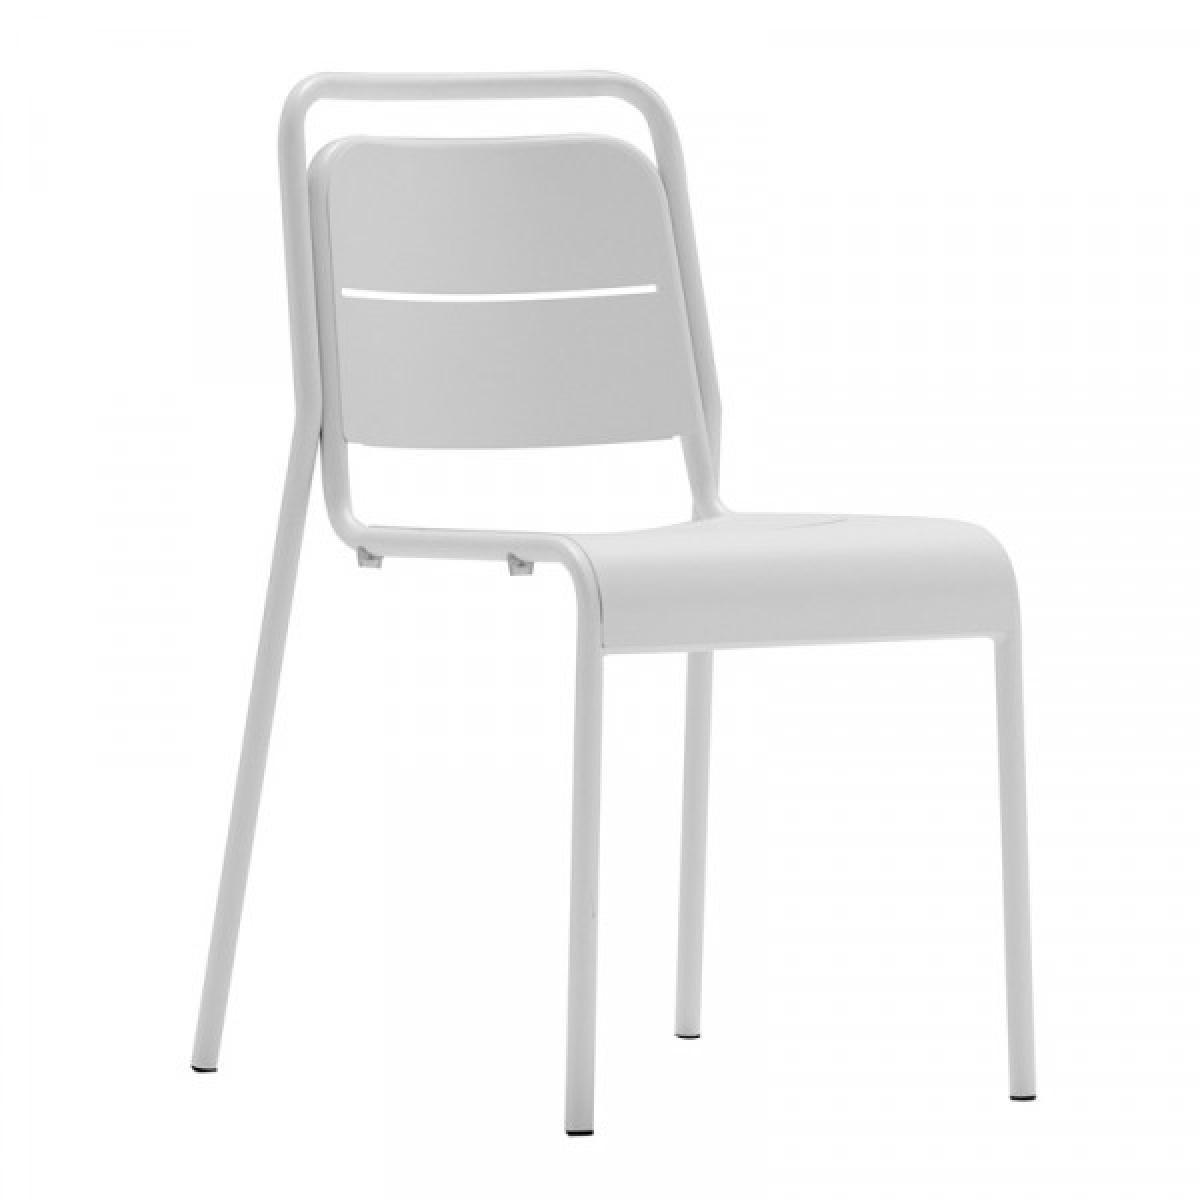 Mathi Design MALAGA - Chaise de terrasse blanche